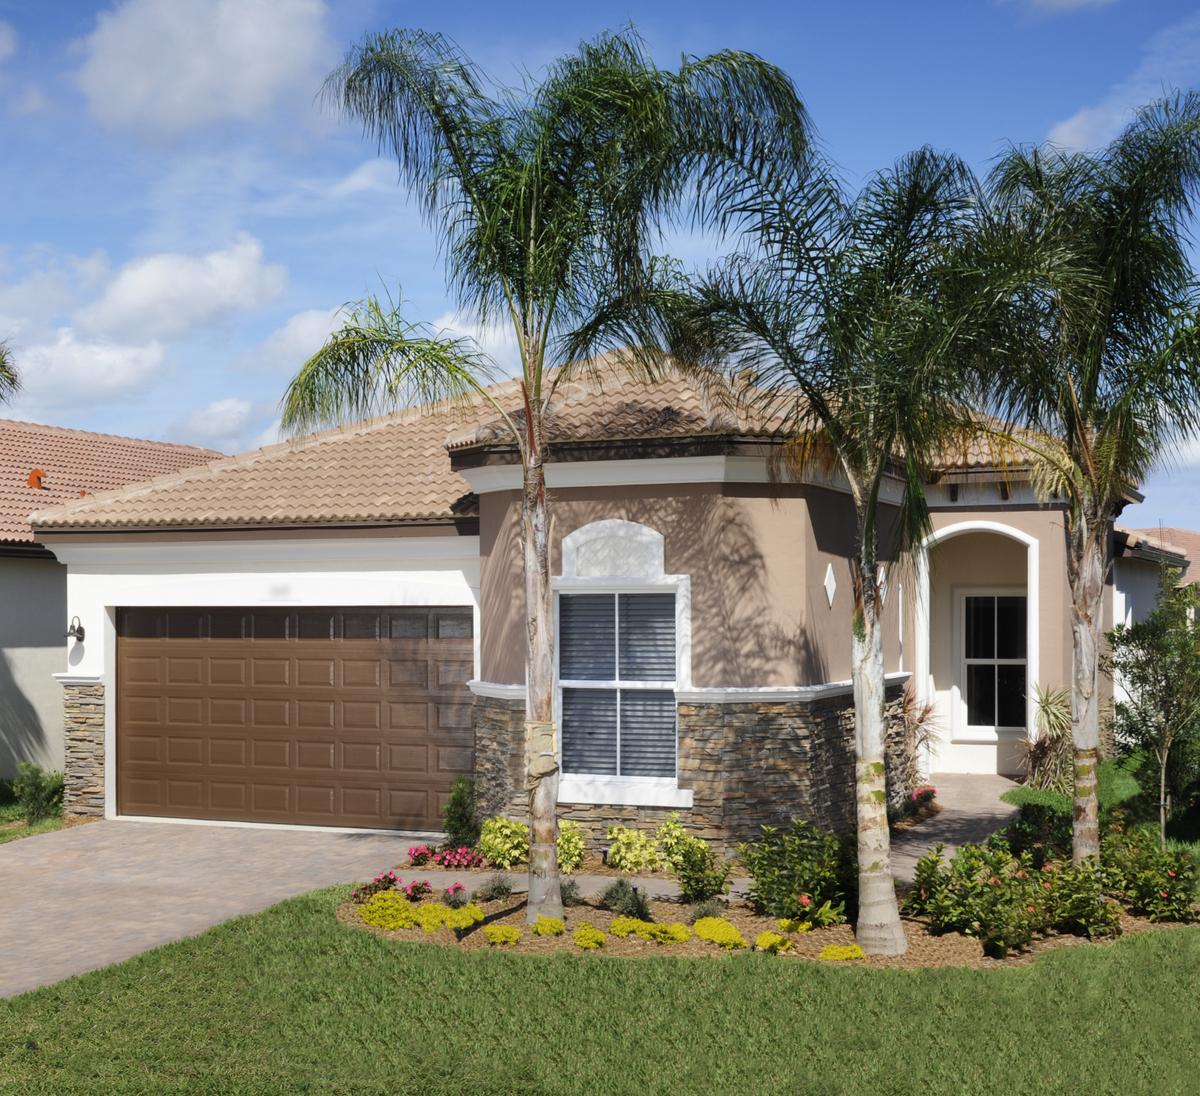 Villaggio reserve tops 300 homes sold at delray beach for Spec home builders near me